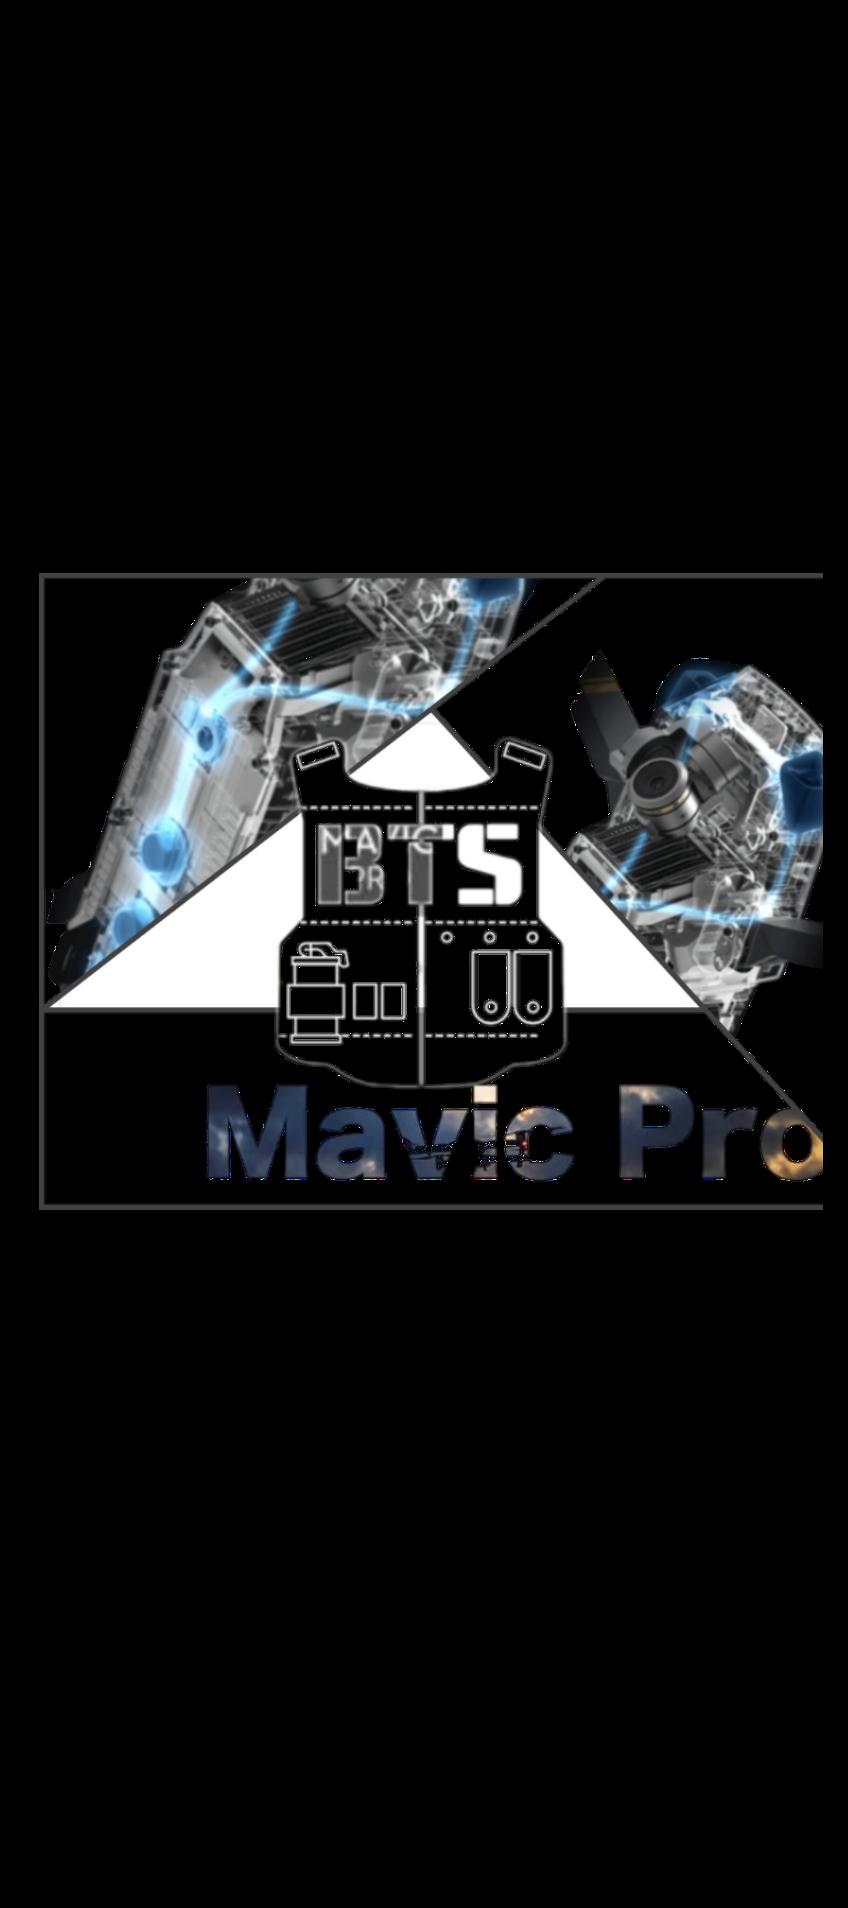 cover DJI MAVIC SHIRT